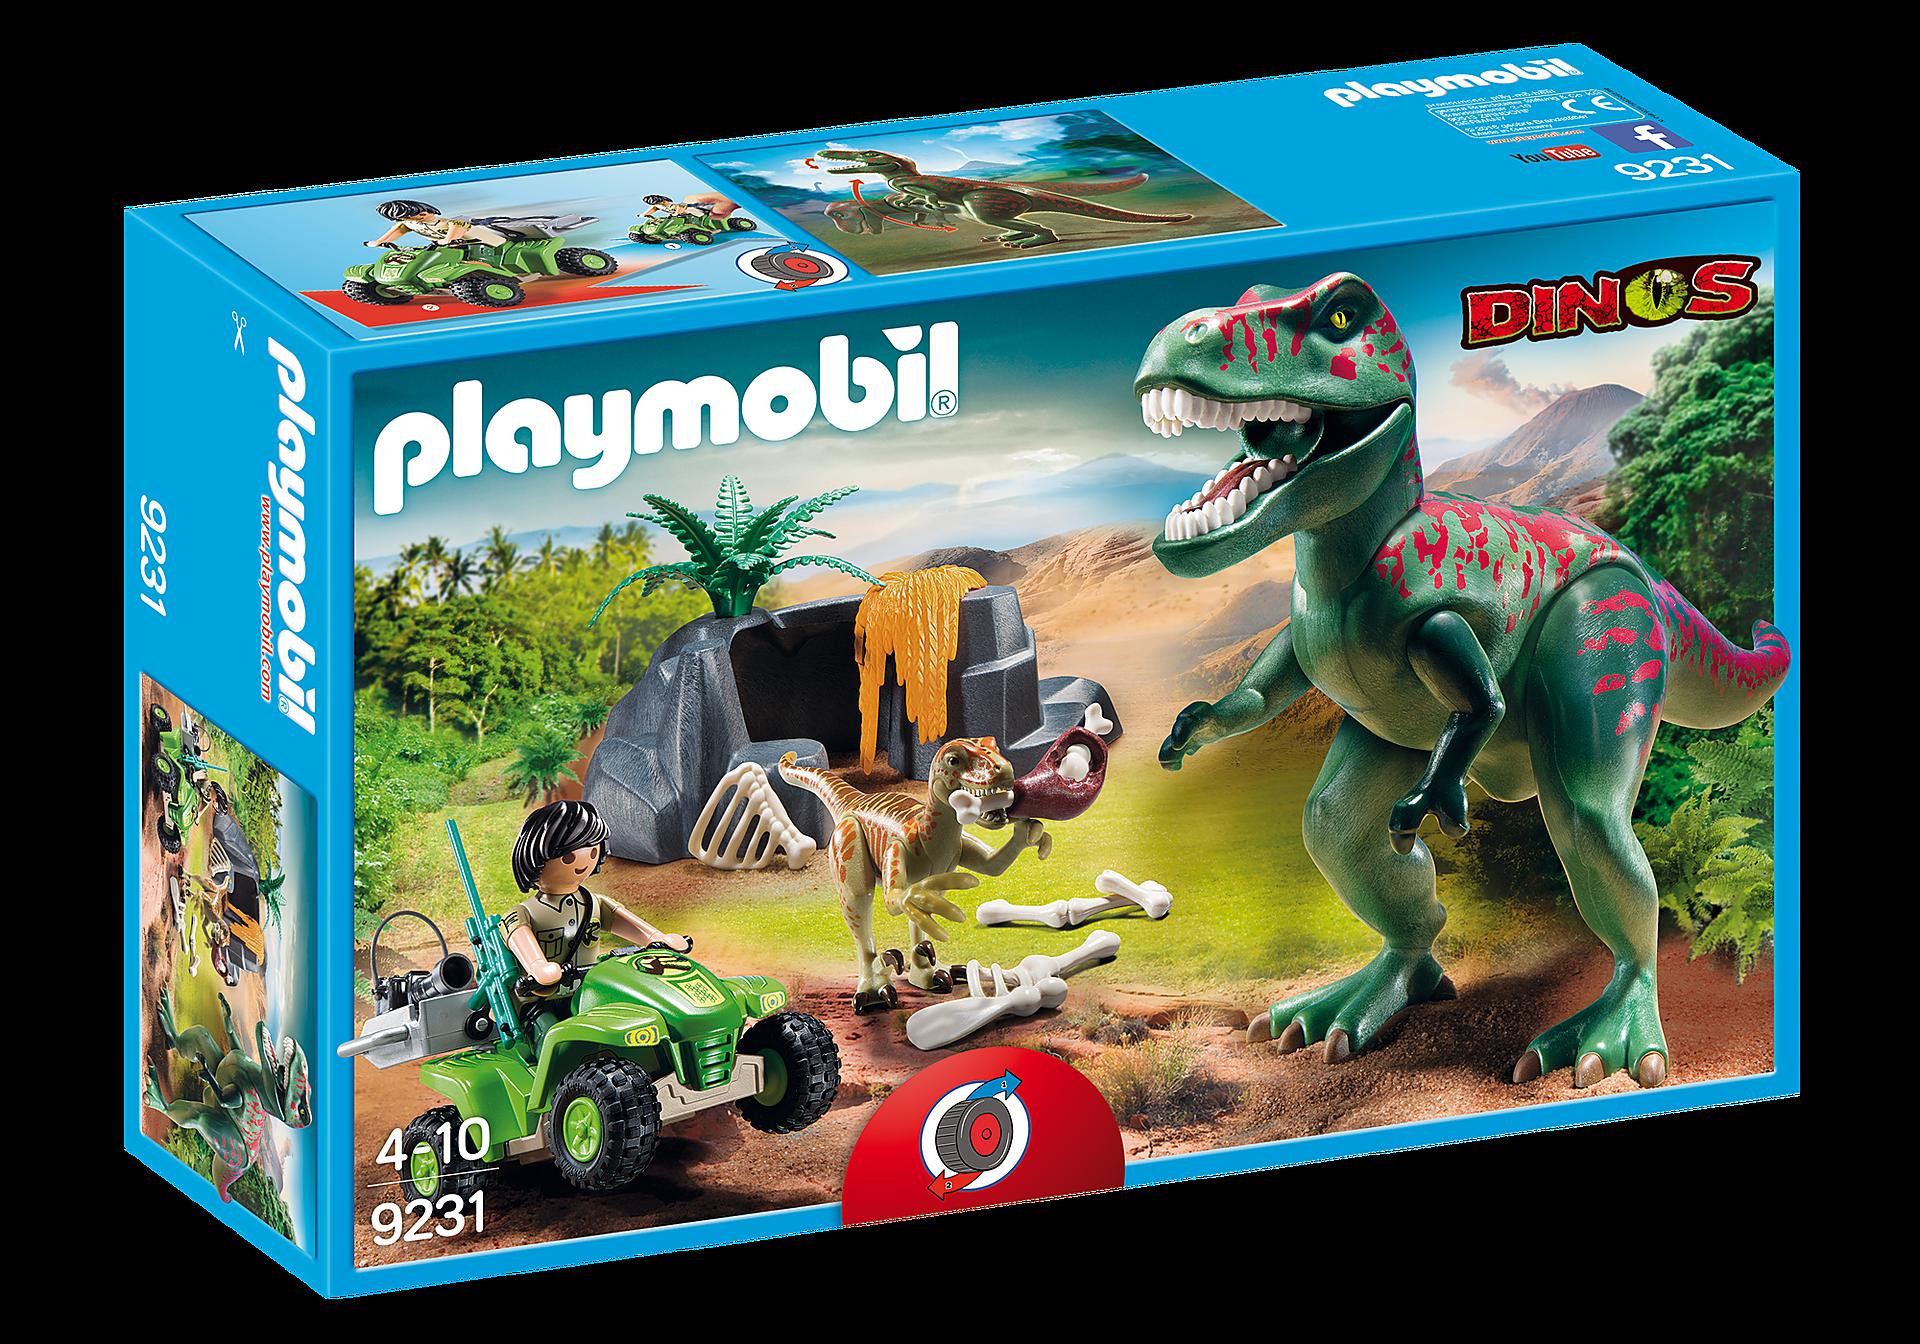 http://media.playmobil.com/i/playmobil/9231_product_box_front/Onderzoeker met dino's